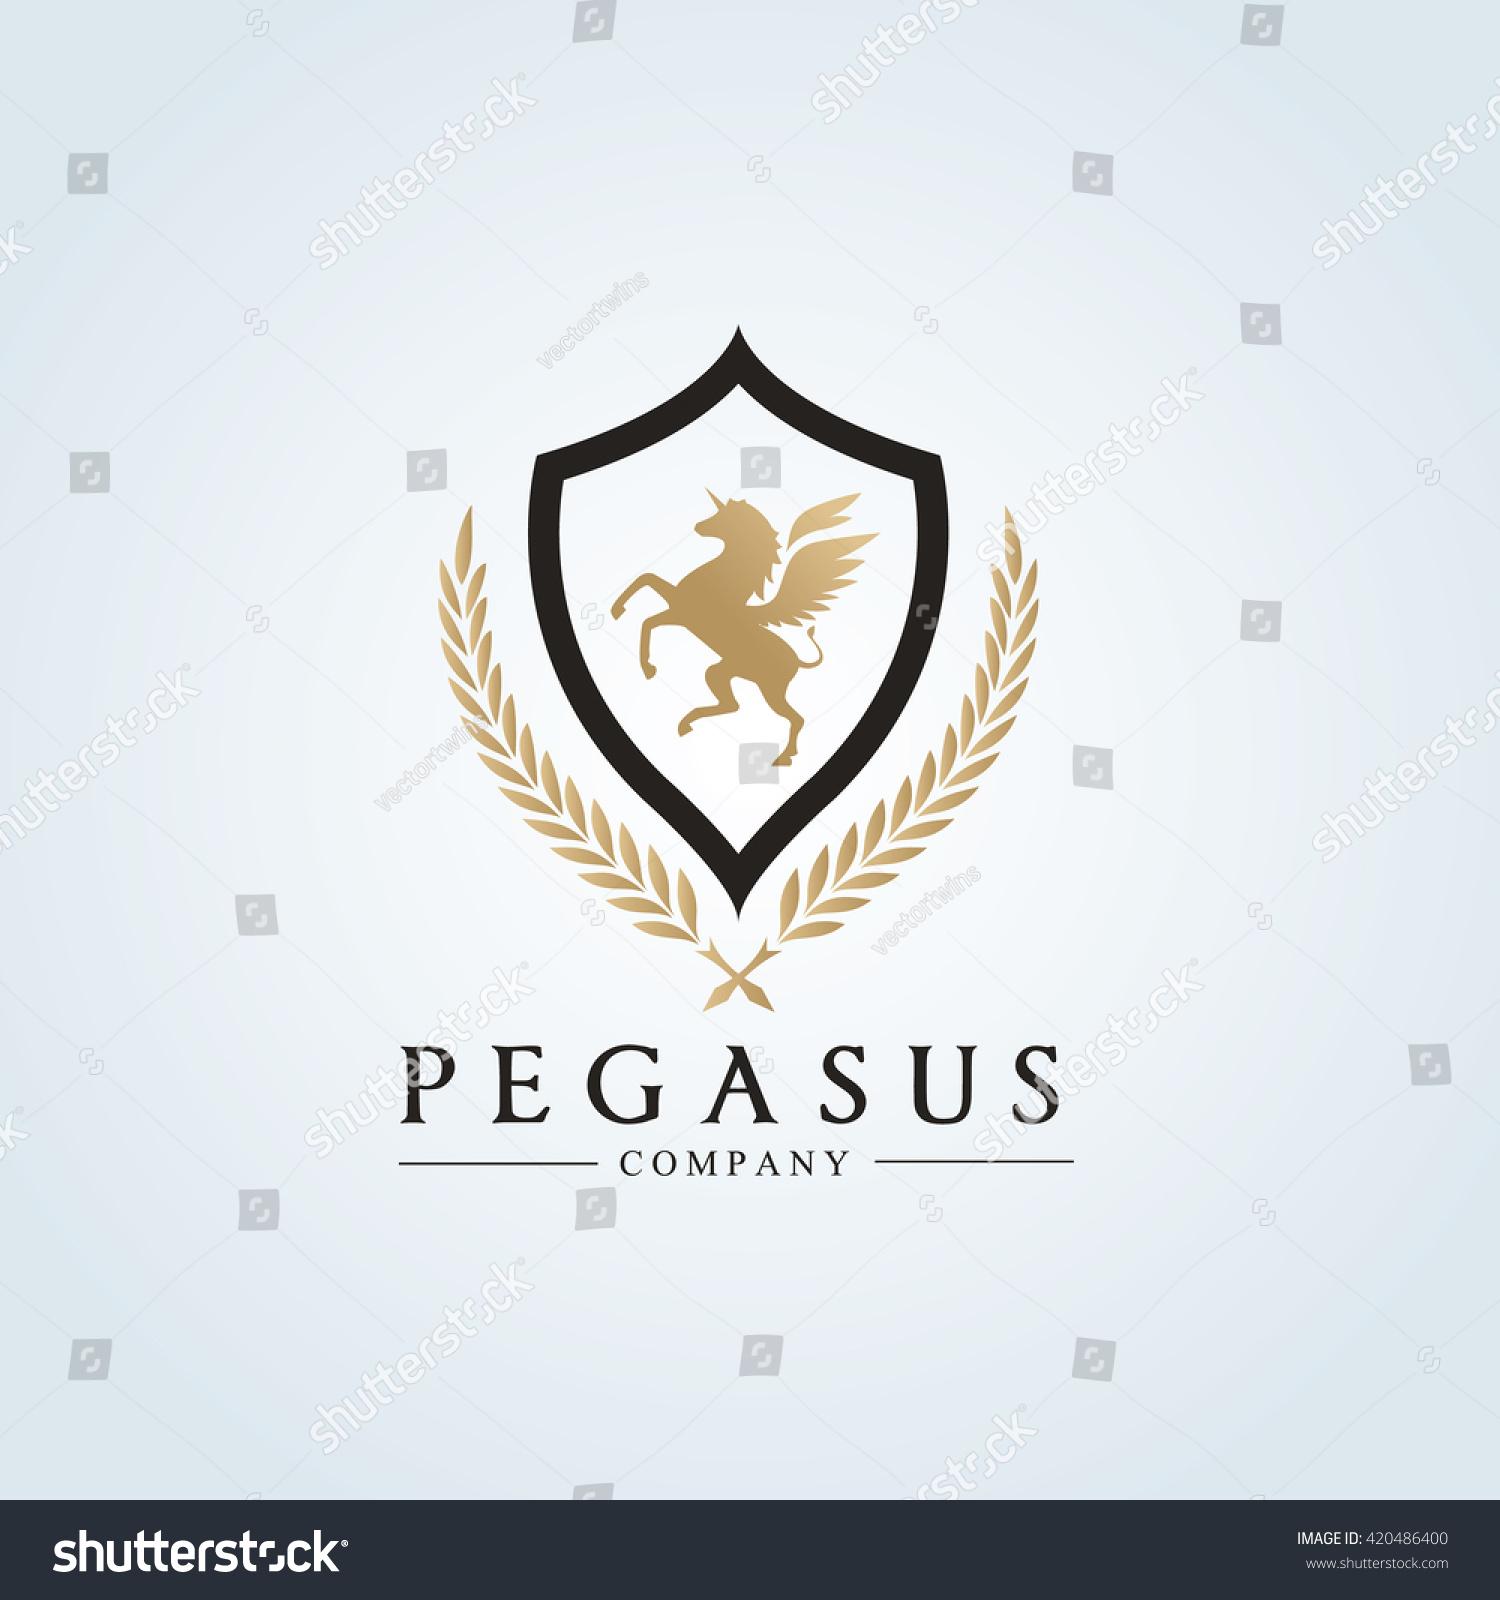 Pegasus Logoluxury Brand Logo Design Vector Stock Vector 420486400